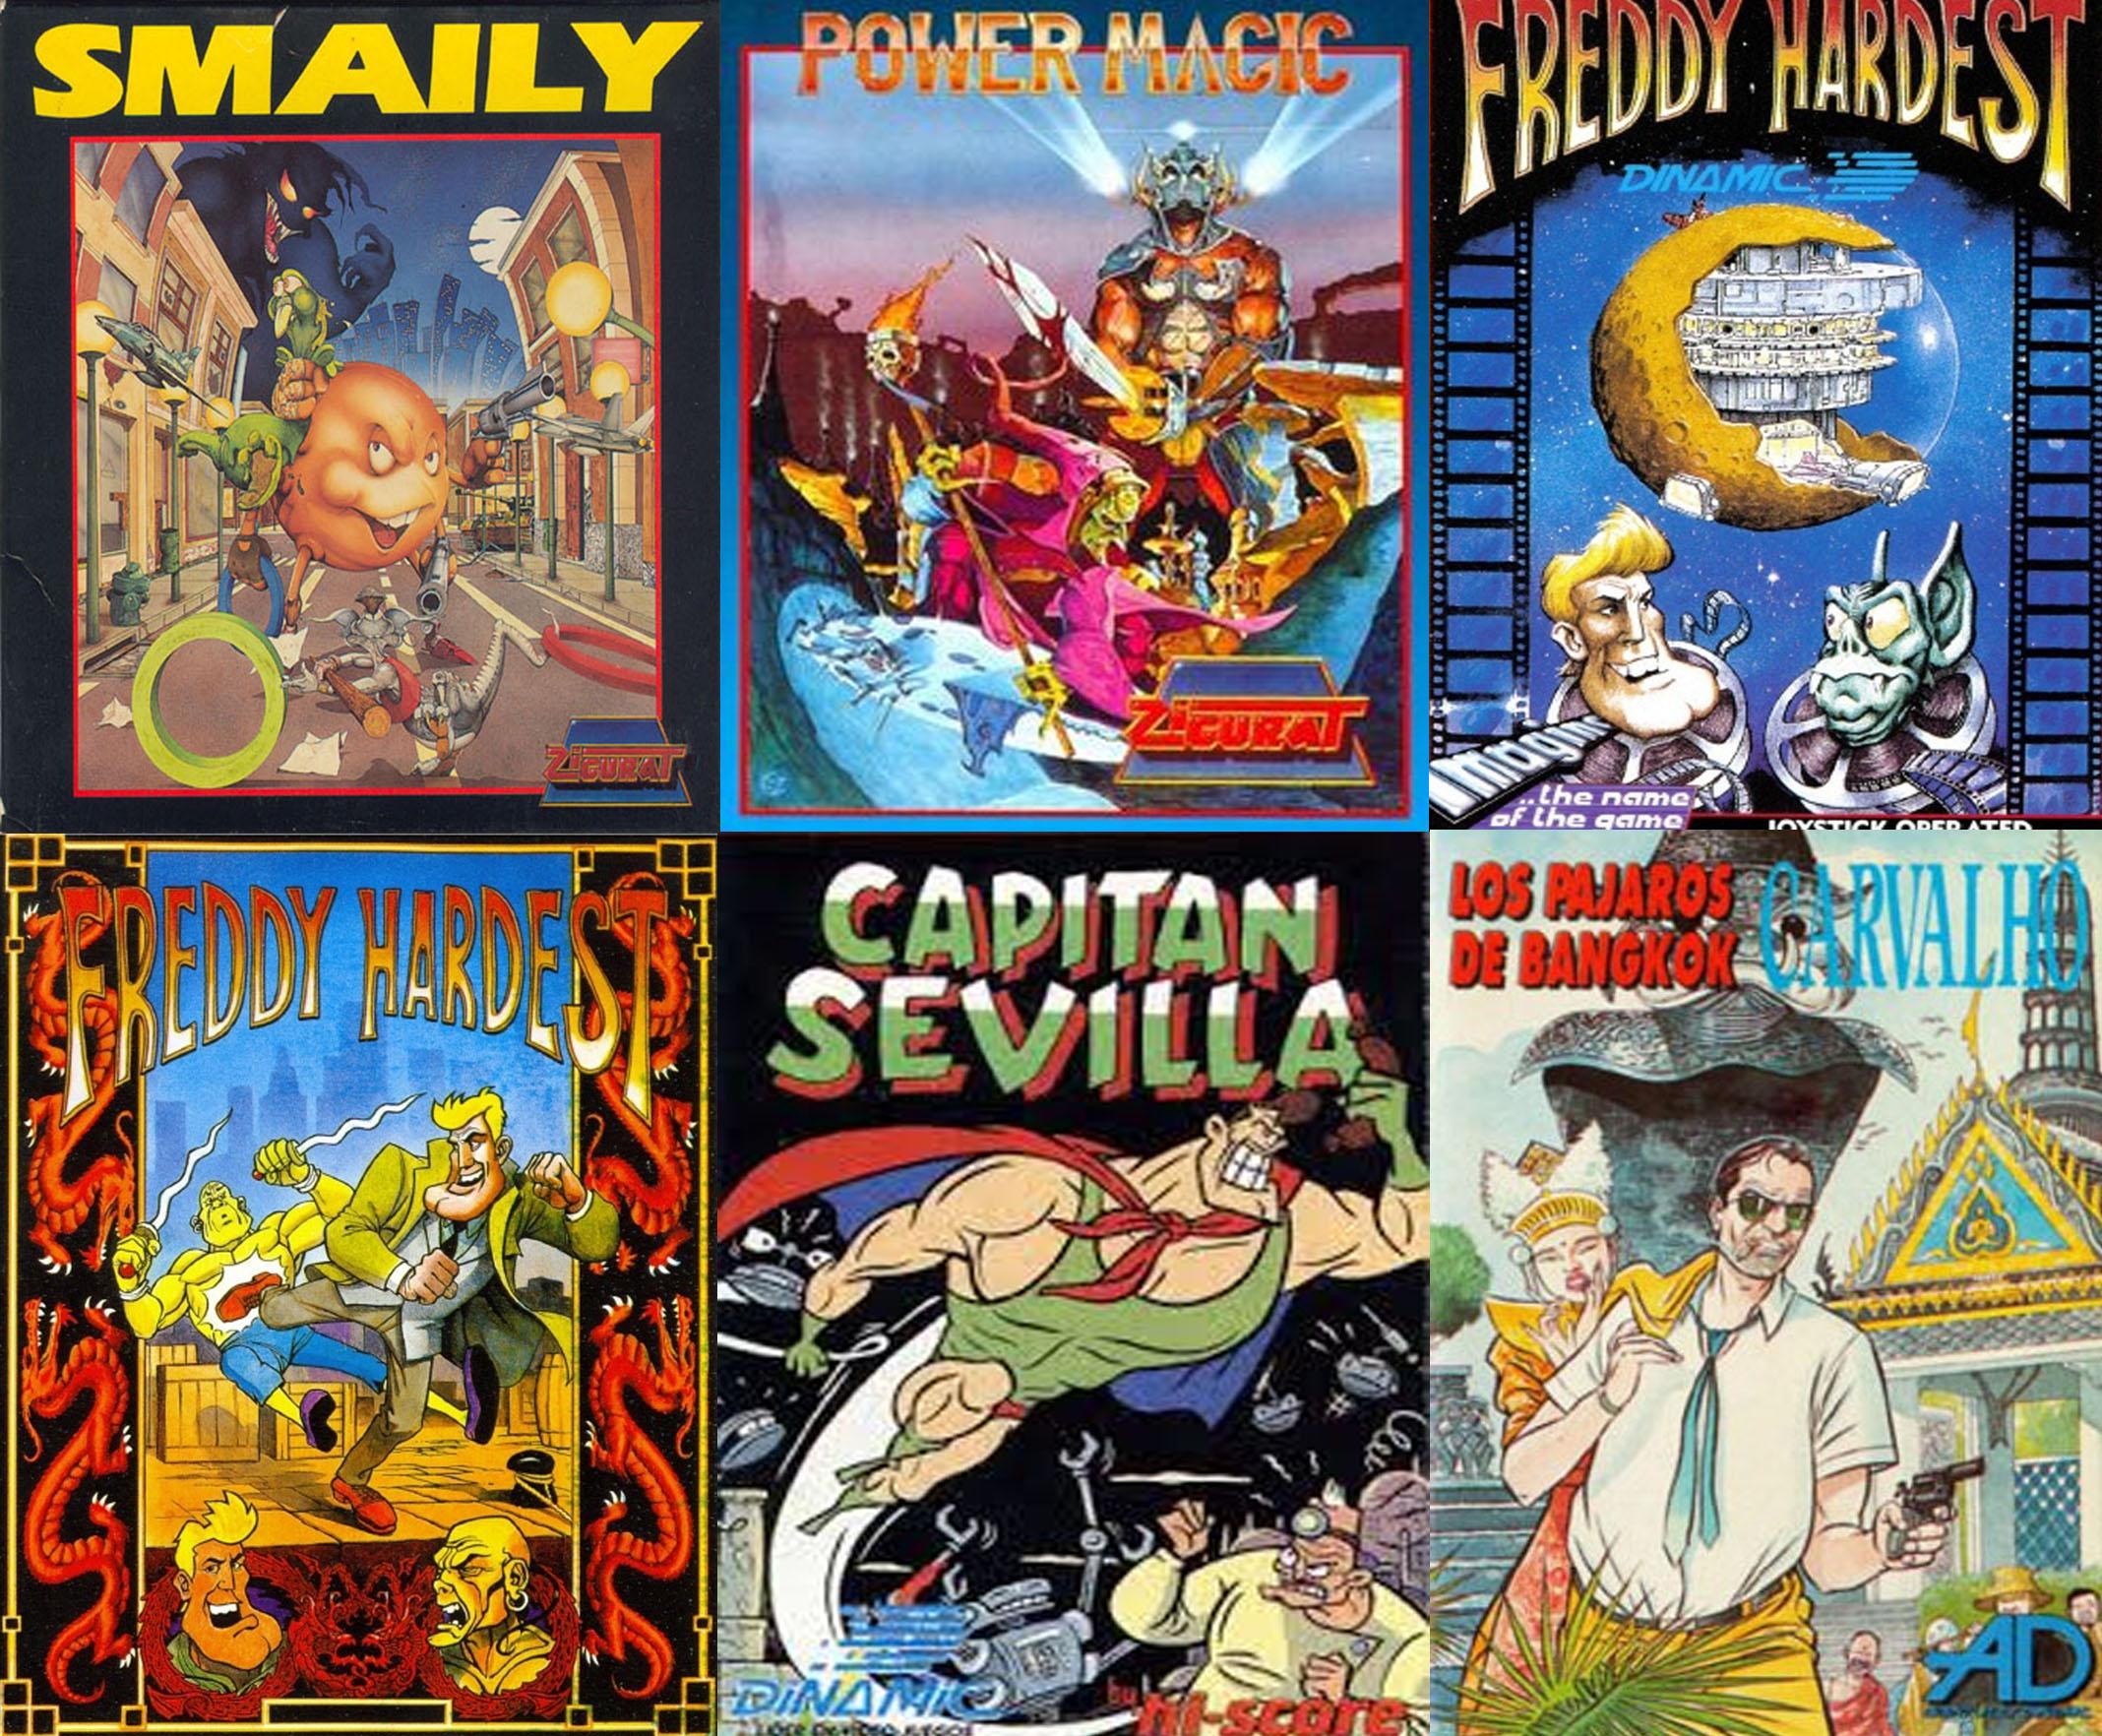 Smaily. Power magic. Freddy Hardest. Freddy Hardest en Manhattan sur. Capitán Sevilla. Los pájaros de Bangkok.